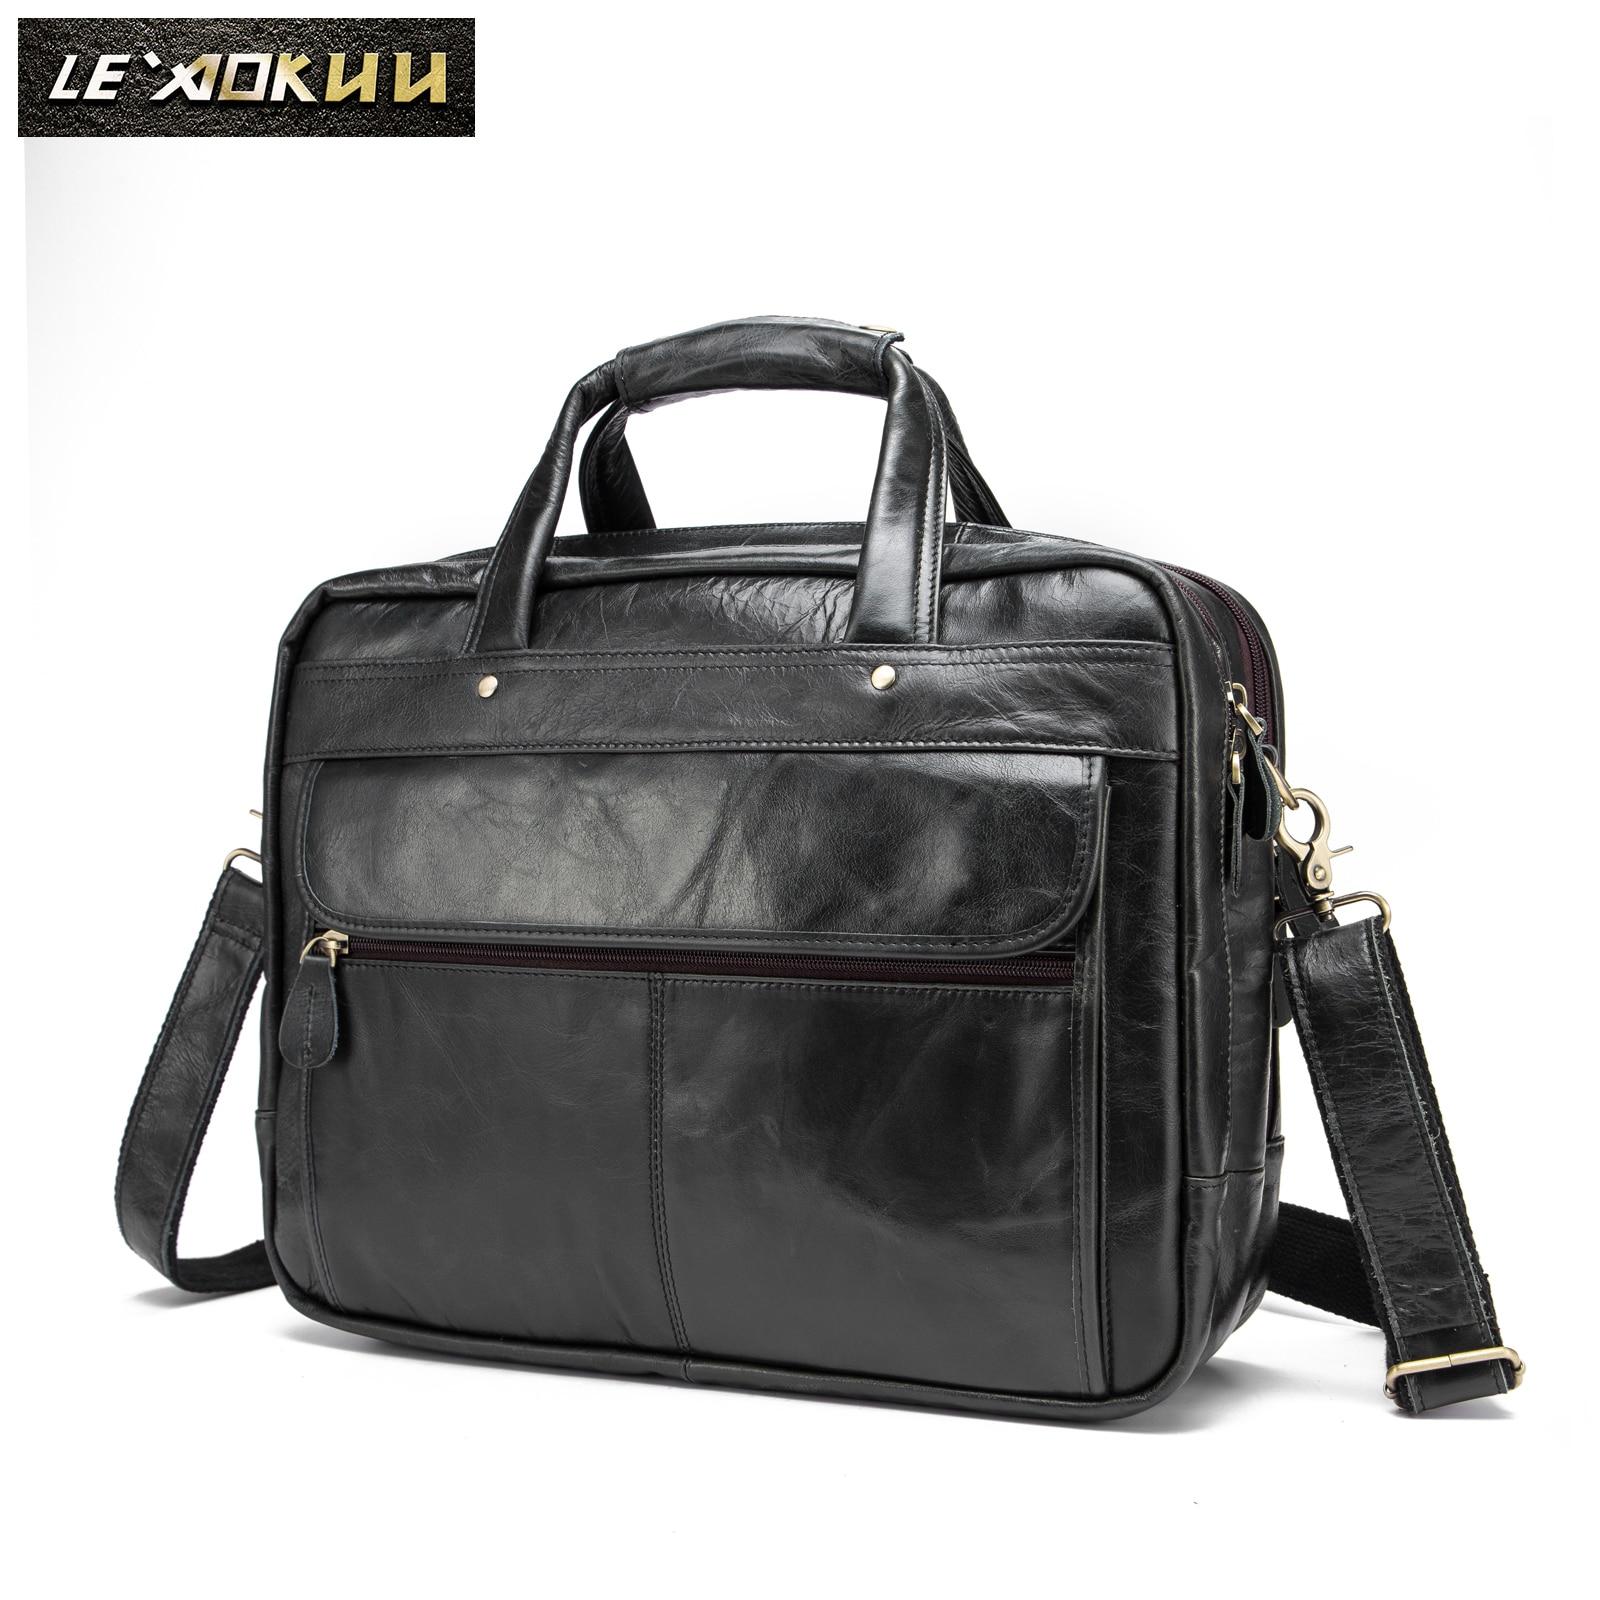 Men Oil Waxy Leather Antique Design Business Briefcase Laptop Document Case Fashion Attache Messenger Bag Tote Portfolio 7146bb